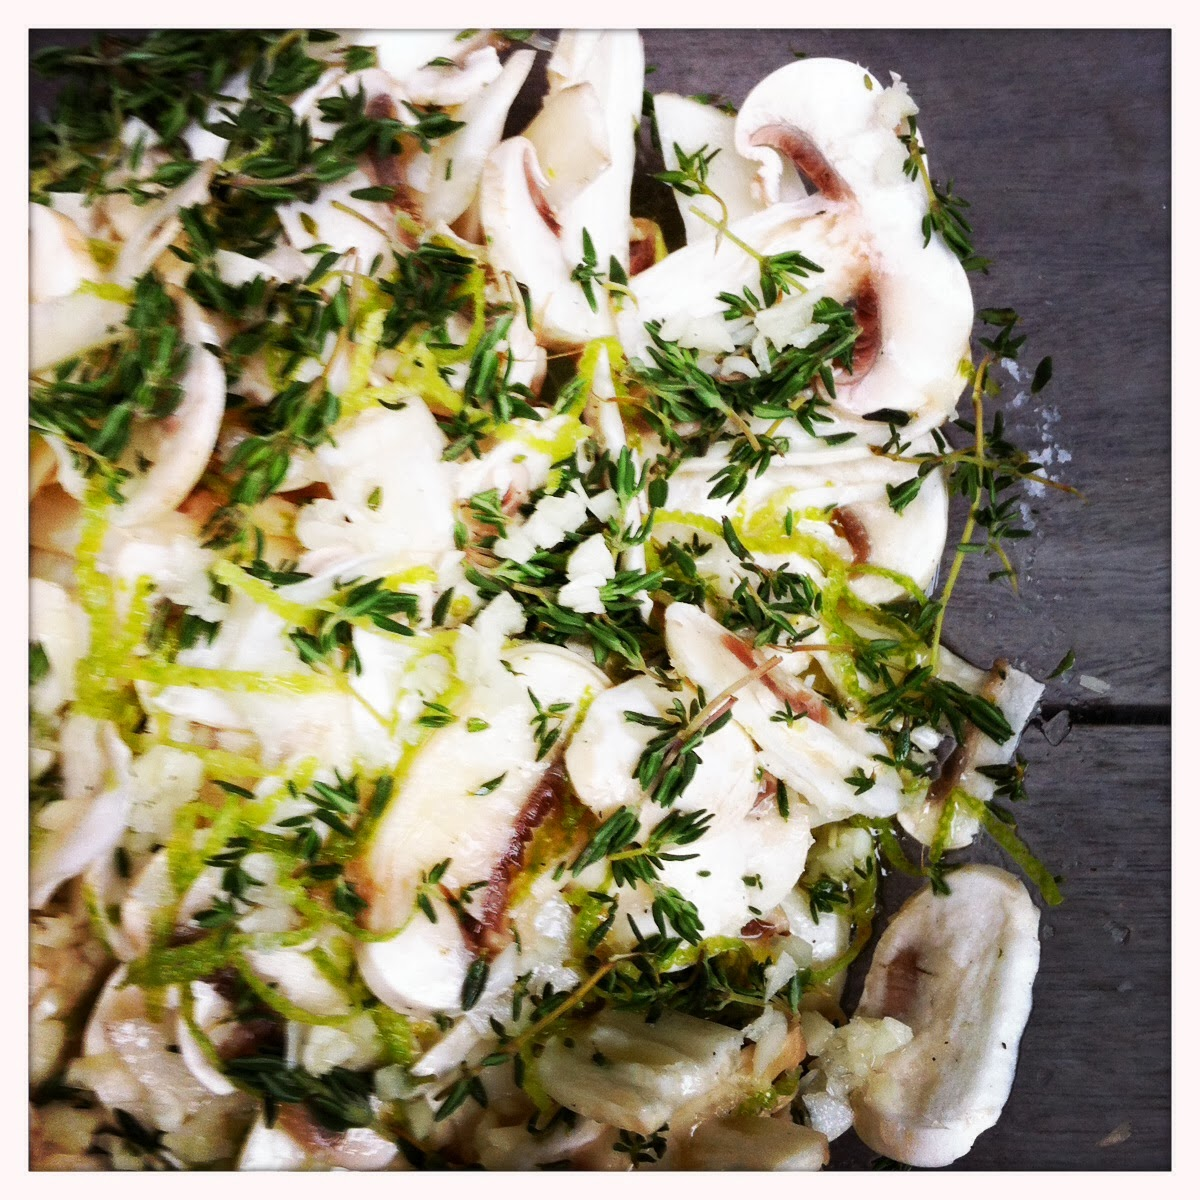 koek!: Nigella Lawson's linguine with lemon, garlic and ...